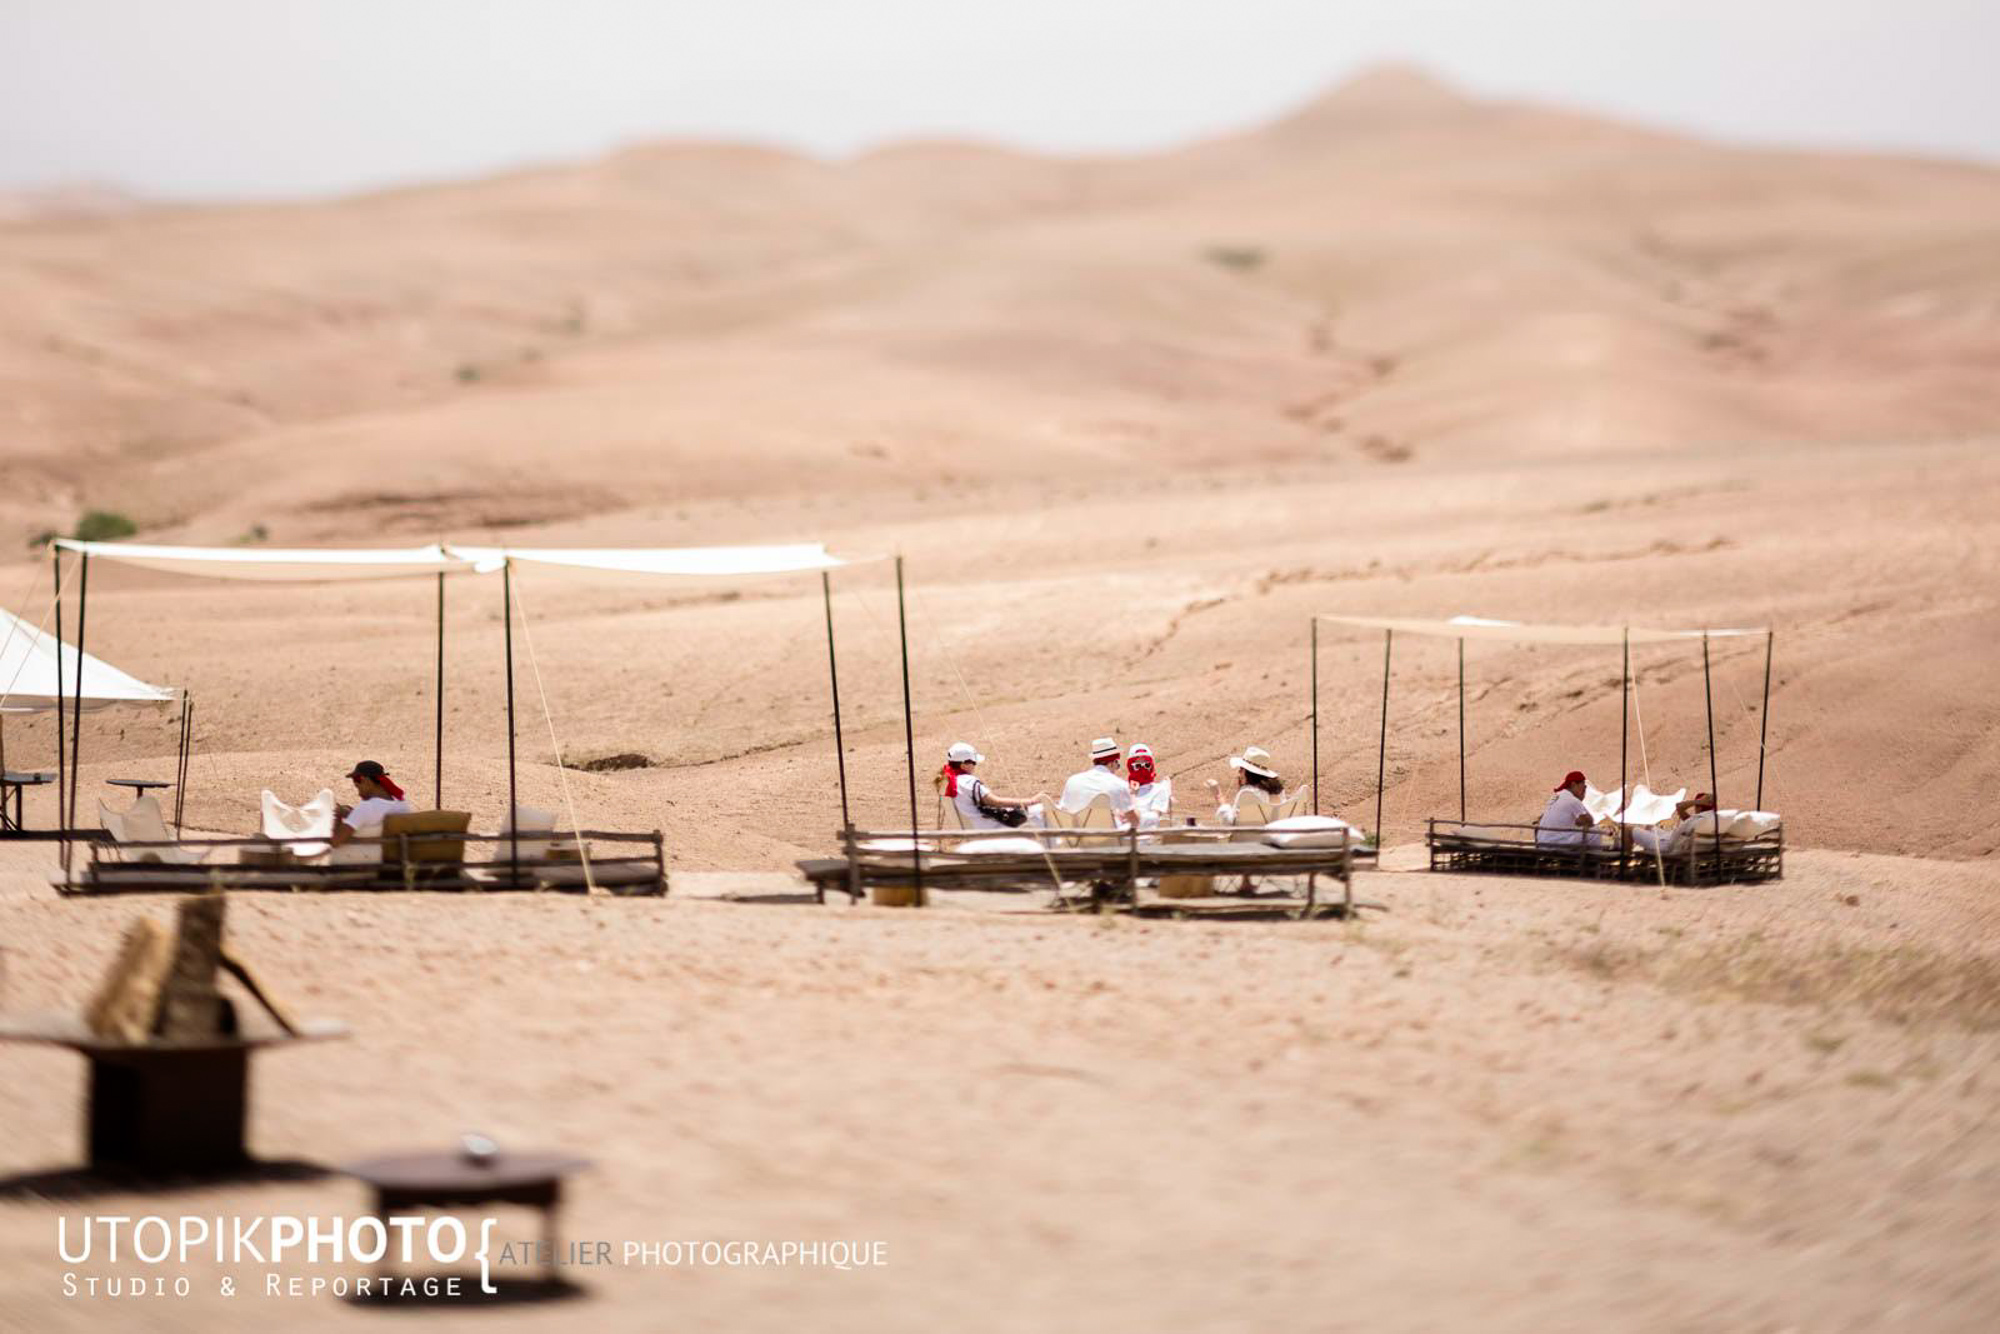 organisation de séminaire diner et déjeuner désert marrakech agafay maroc